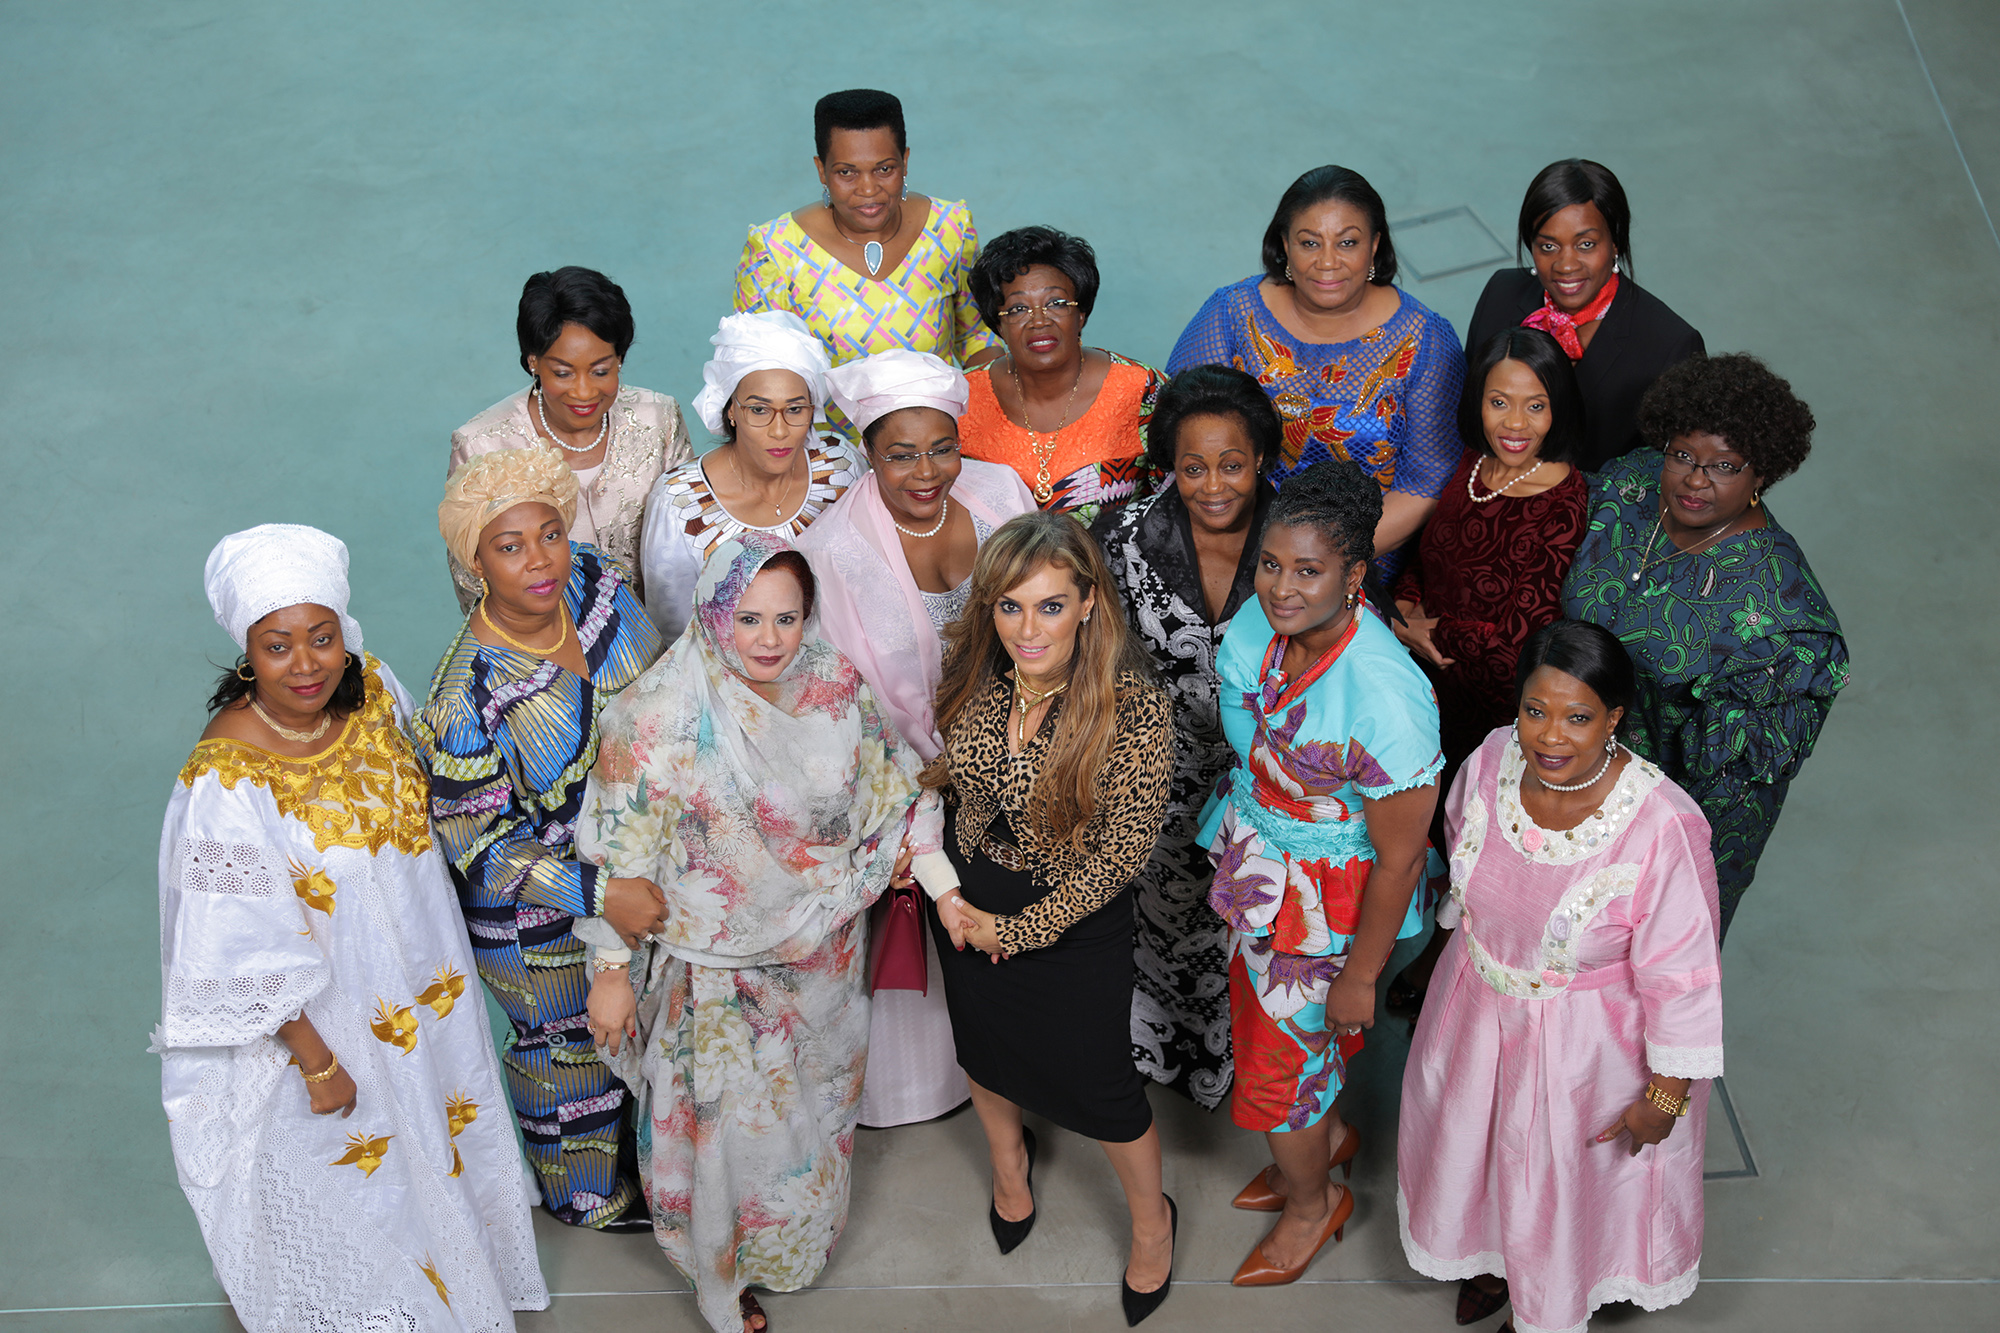 Dr. Rasha Kelej, CEO of Merck Foundation with H.E. CONDÉ DJENE, The First Lady of Guinea Conakry; H.E FATIMA MAADA, The First Lady of Sierra Leone; H.E. PROFESSOR GERTRUDE MUTHARIKA, The First Lady of Malawi; H.E. FATOUMATTA BAH-BARROW, The First Lady of The Gambia; H.E DENISE NKURUNZIZA, The First Lady of Burundi; H.E AÏSSATA ISSOUFOU MAHAMADO, The First Lady of Niger; H.E. BRIGITTE TOUADERA, The First Lady of Central African Republic; H.E. REBECCA AKUFO-ADDO, The First Lady of Ghana; H.E. CLAR WEAH, The First Lady of Republic of Liberia; H.E. ANTOINETTE SASSOU-NGUESSO, The First Lady of Congo Brazzaville; H.E. MONICA GEINGOS, The First Lady of Namibia; H.E. AUXILLIA MNANGAGW, The First Lady of Zimbabwe; H.E. NEO JANE MASISI, The First Lady of Botswana; H.E. DR. ISAURA FERRÃO NYUSI, The First Lady of Mozambique and Former First Lady of Mauritania